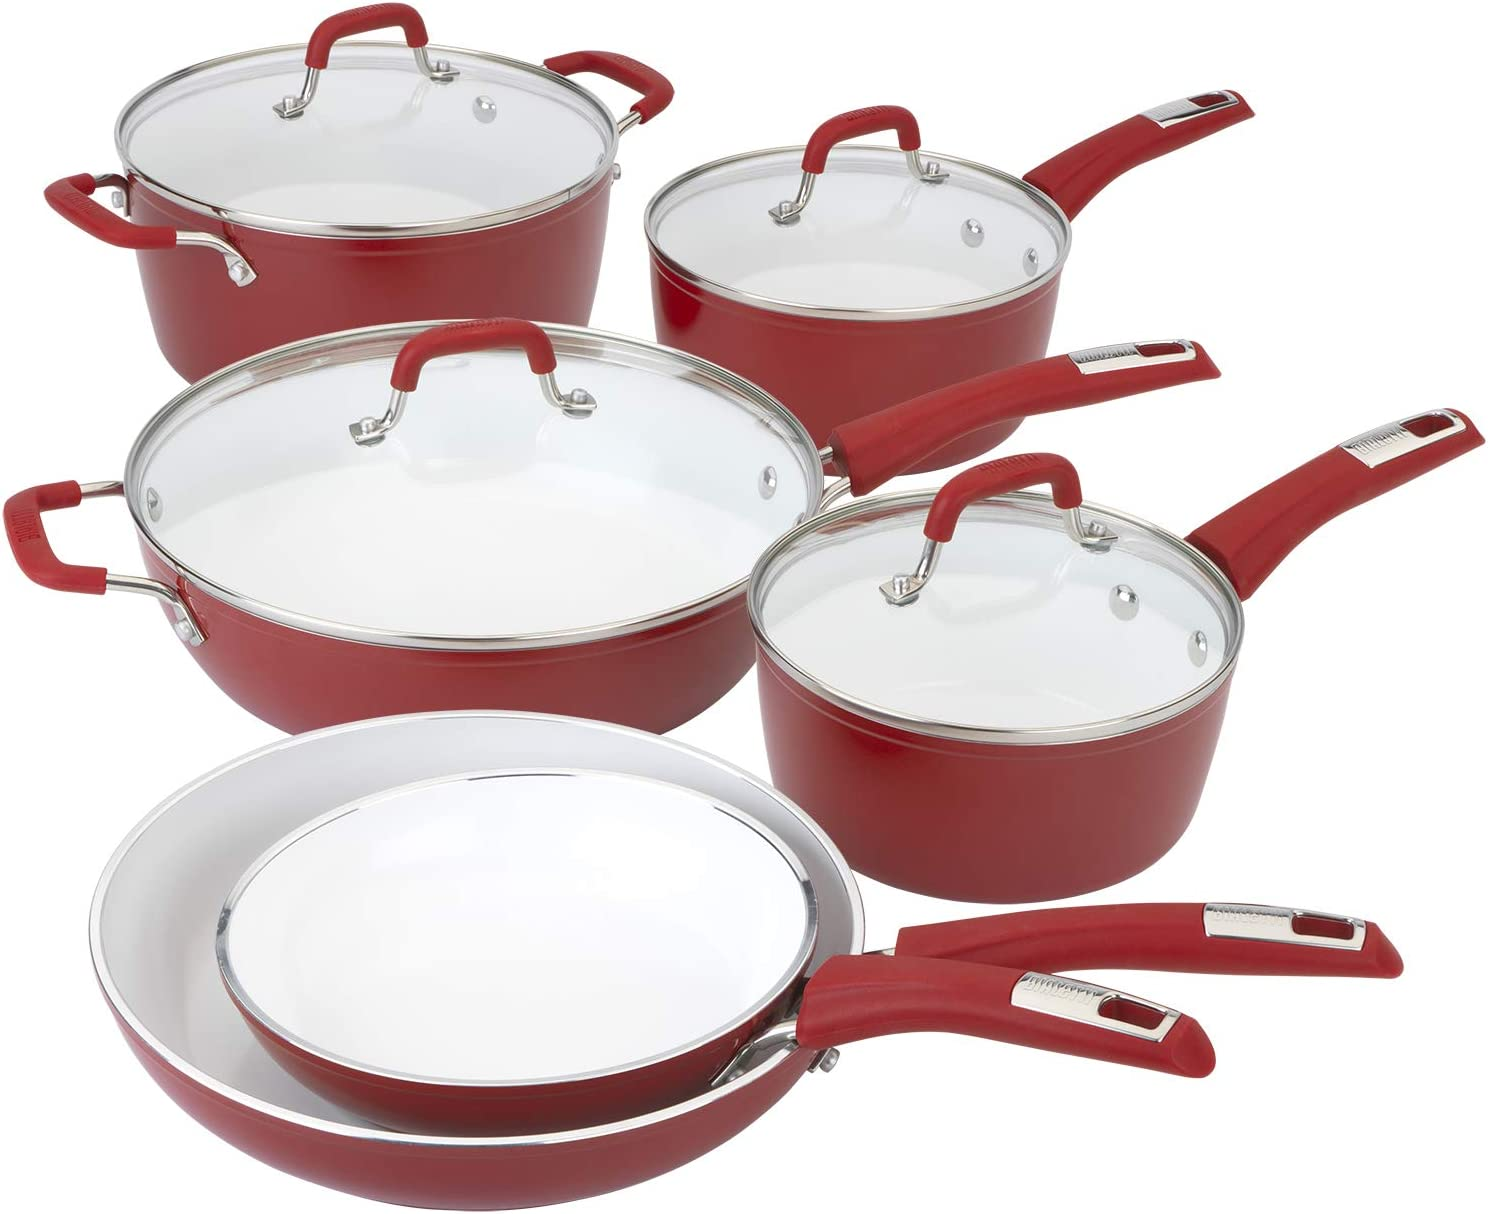 Bialetti Aeternum Ceramic Nonstick Cookware Set, 10 Piece, Red/White